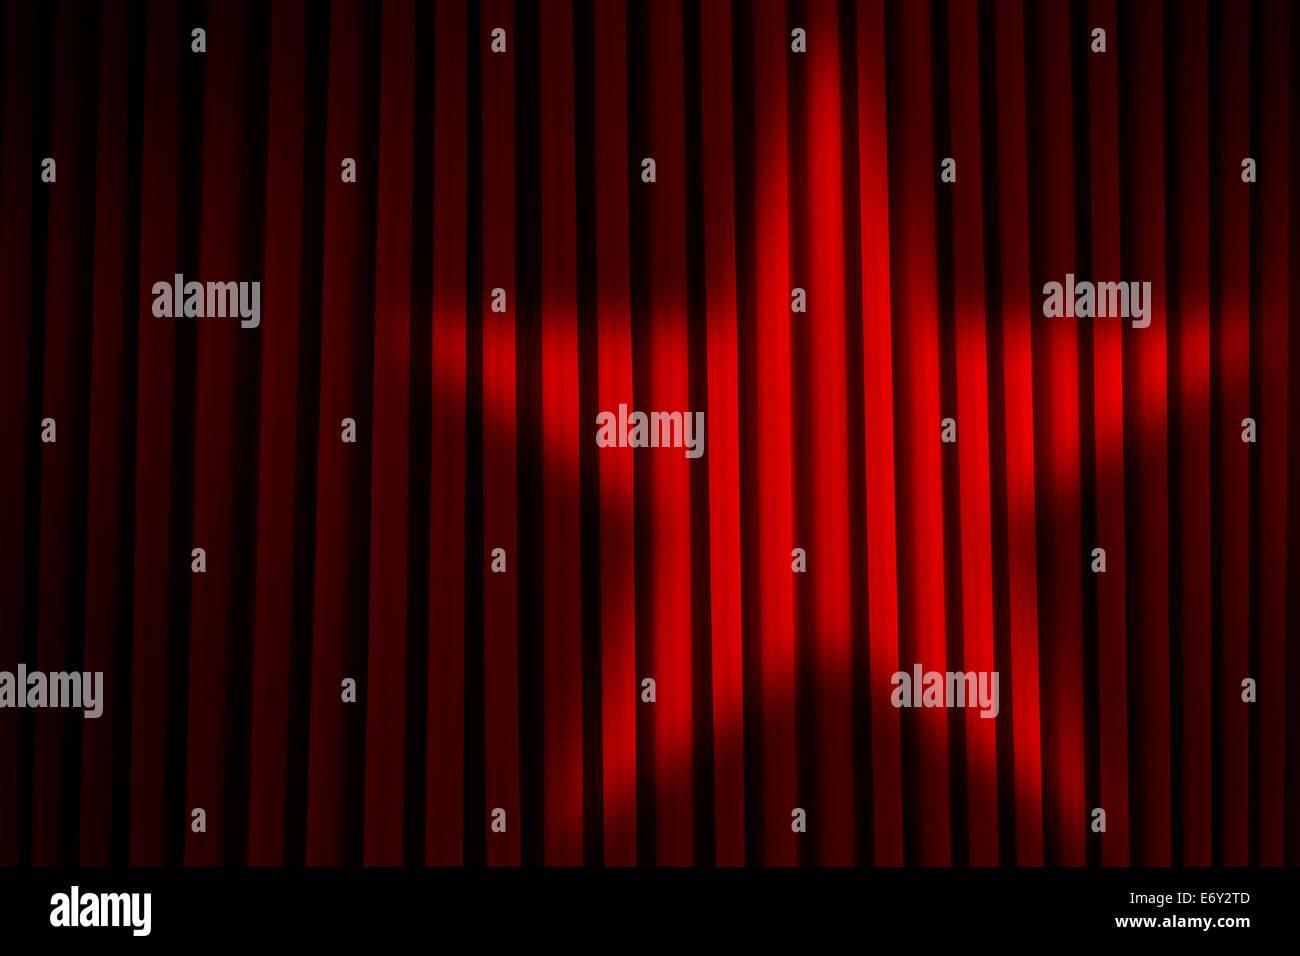 Rot-Theater Bühnenvorhänge mit Sterne Spotlight. Stockfoto